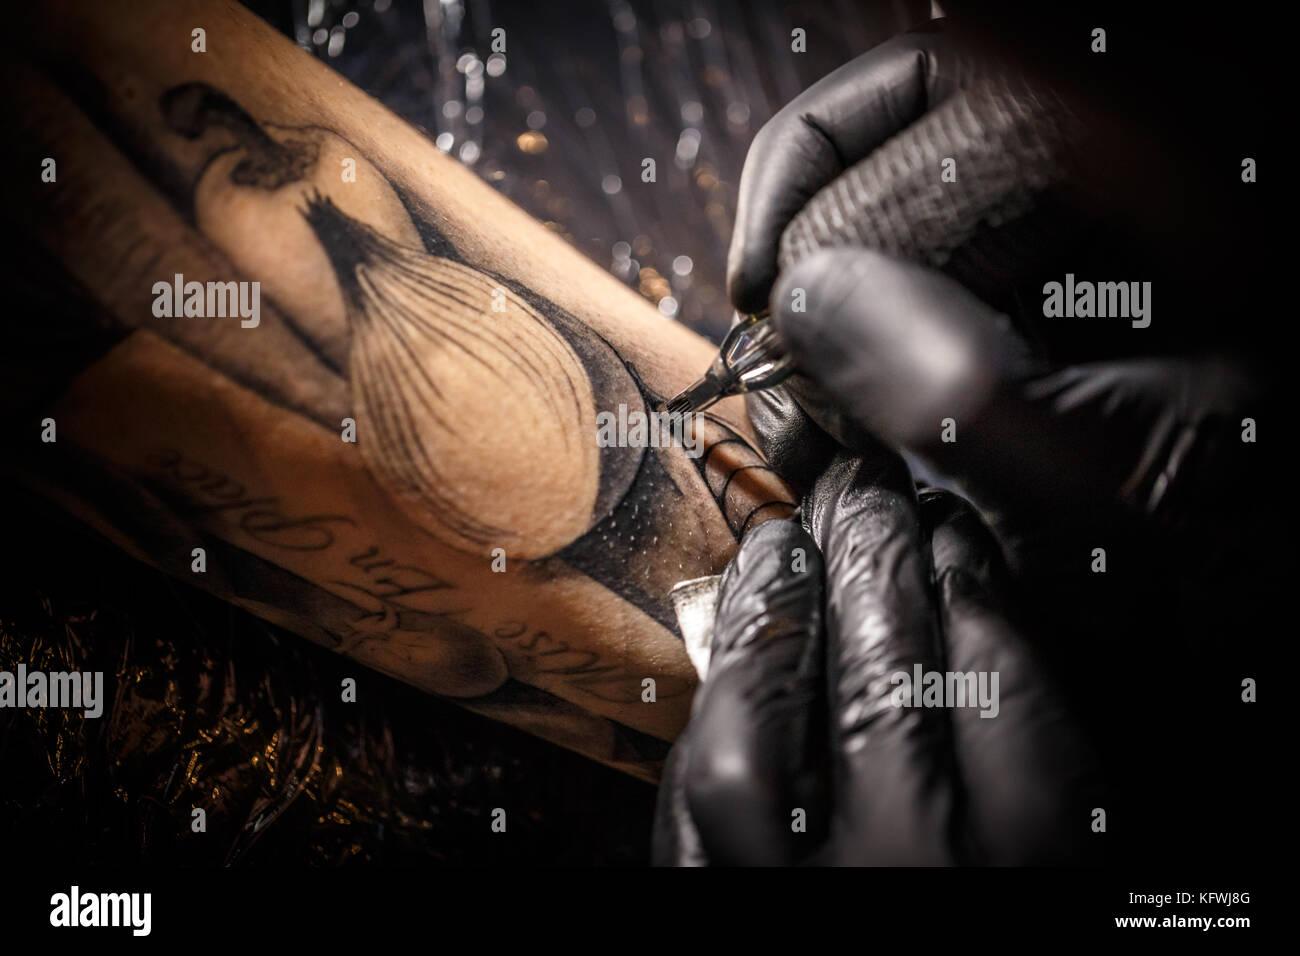 Tattoo master works in black sterile gloves - Stock Image